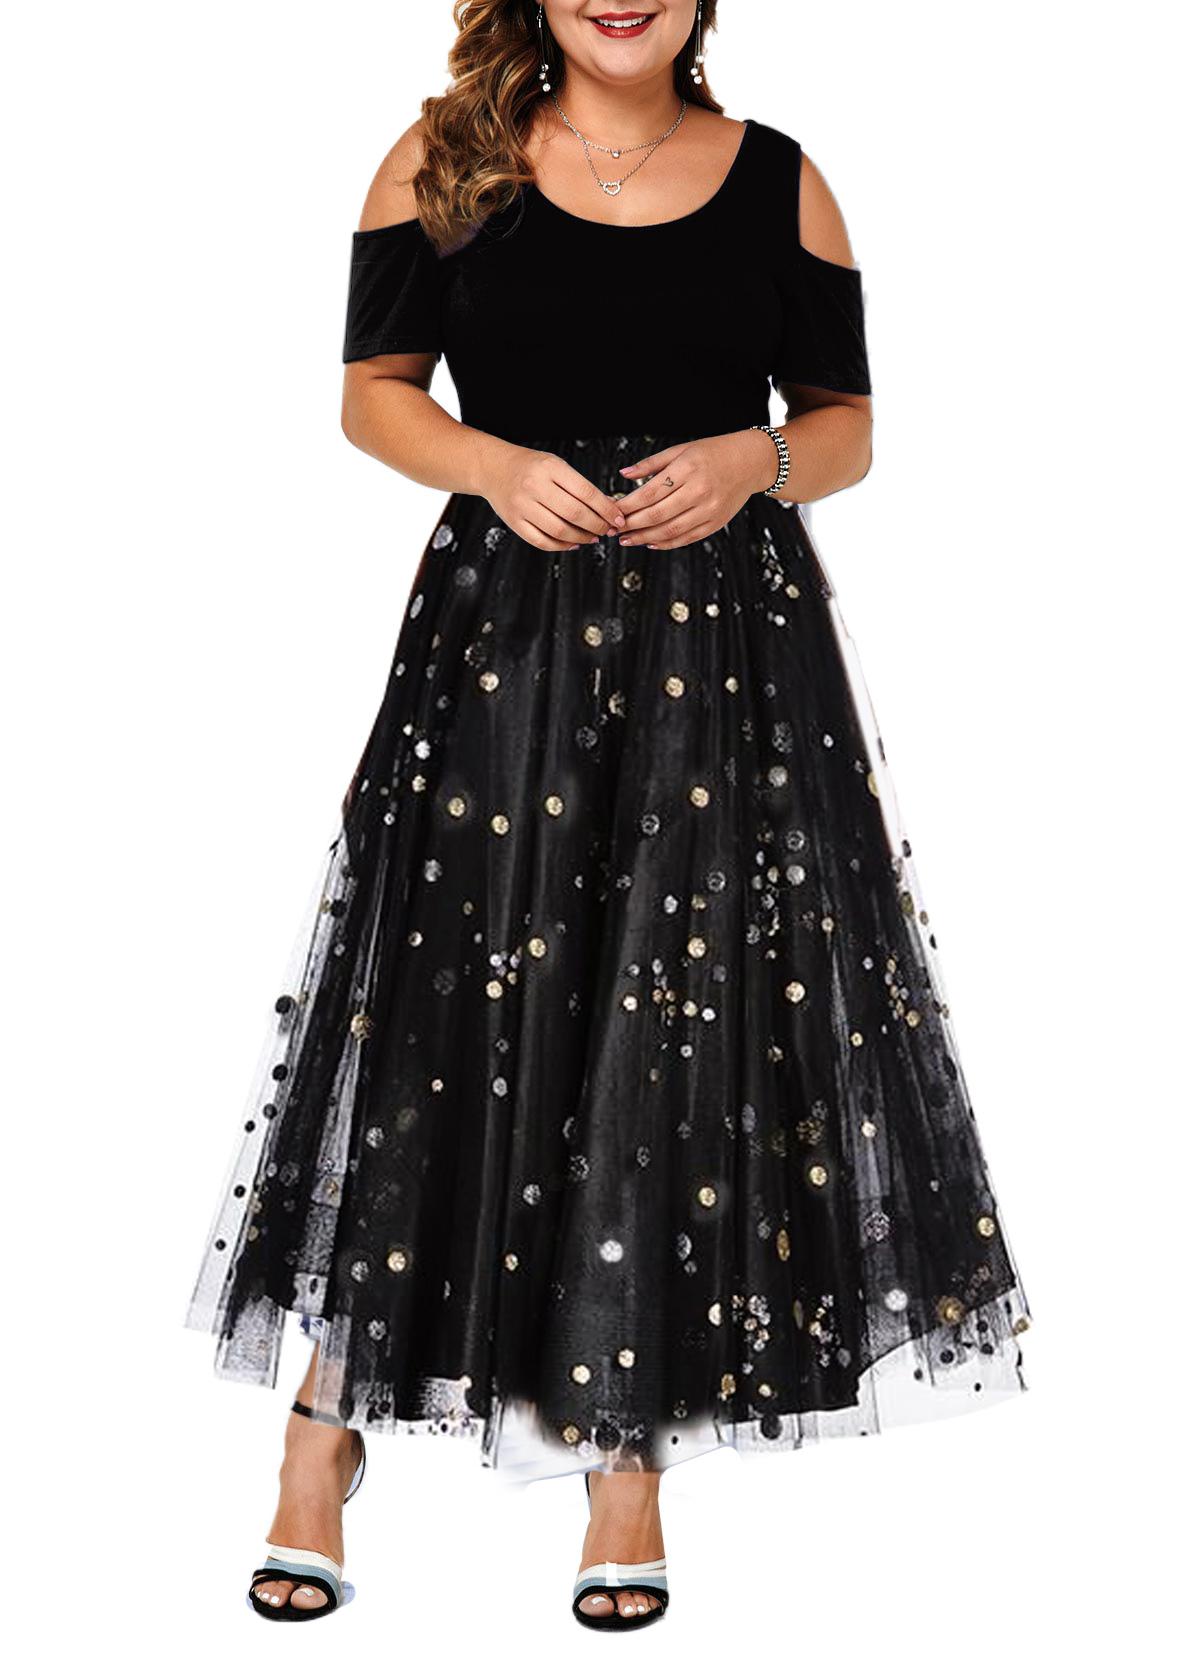 ROTITA Mesh Panel Sequin Embellished Plus Size Dress